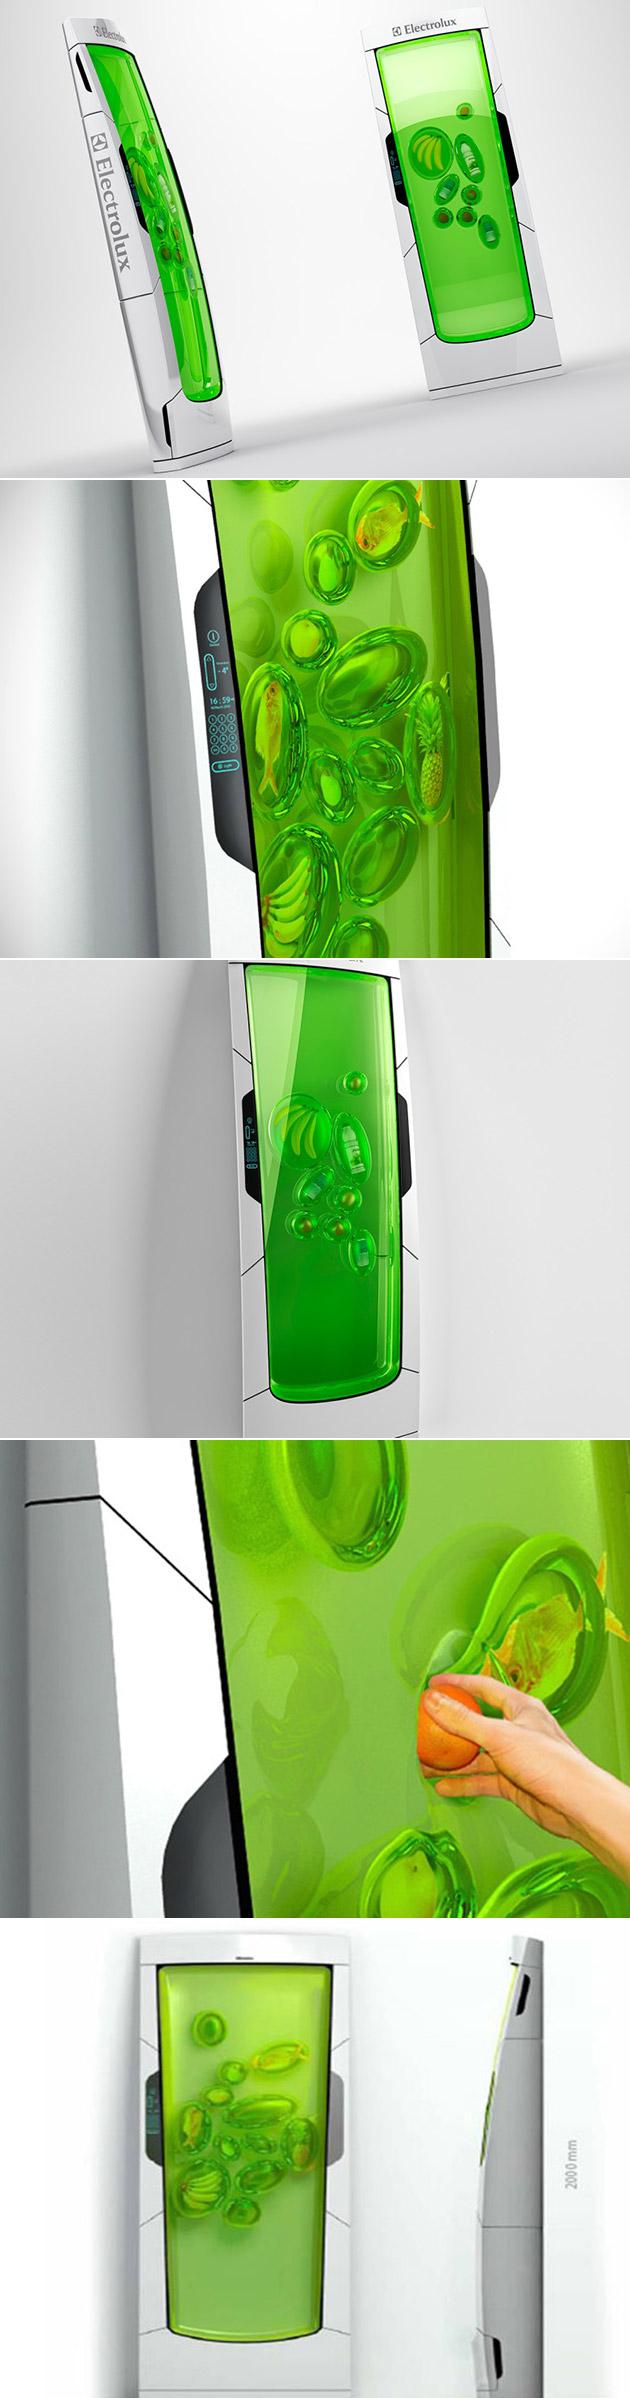 bio-robot-refrigerator